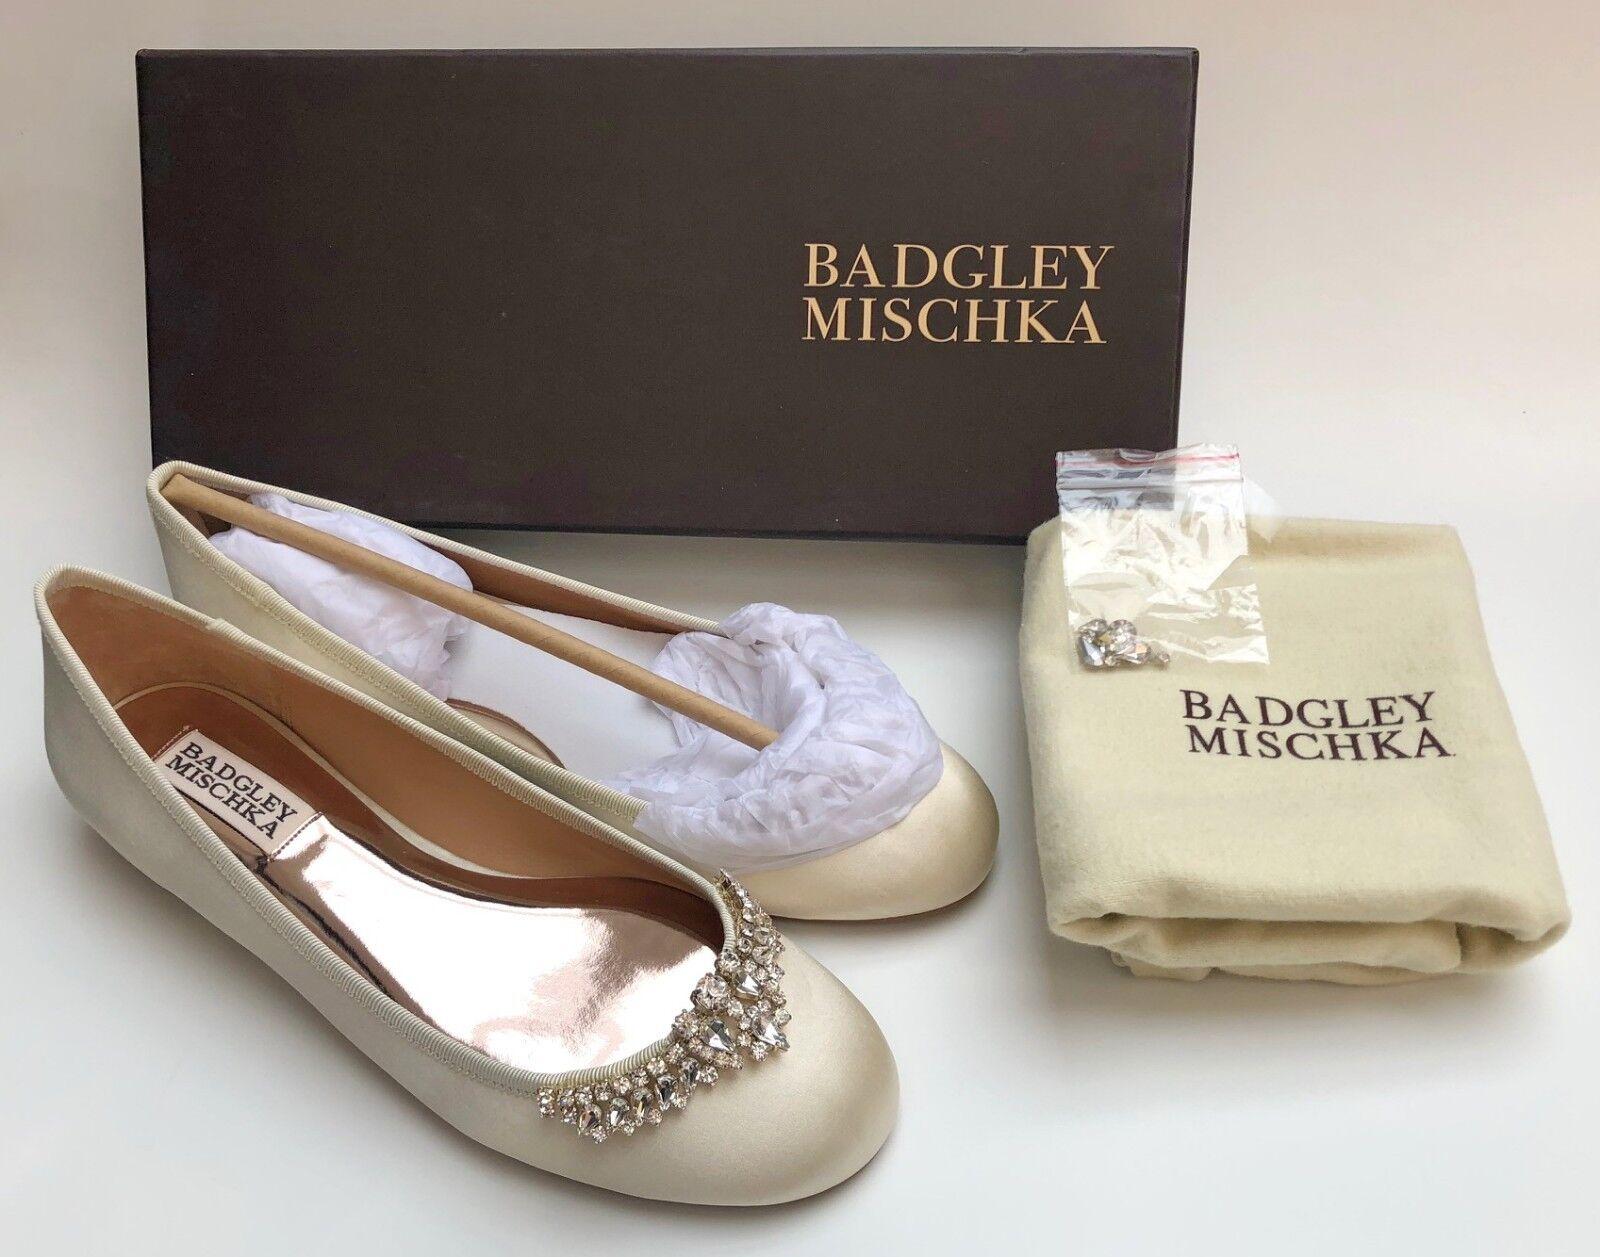 BADGLEY MISCHKA WENDY Embellished Ballet Flats Flats Flats shoes in Ivory Sz 6.5 R 185 NIB 6779a1